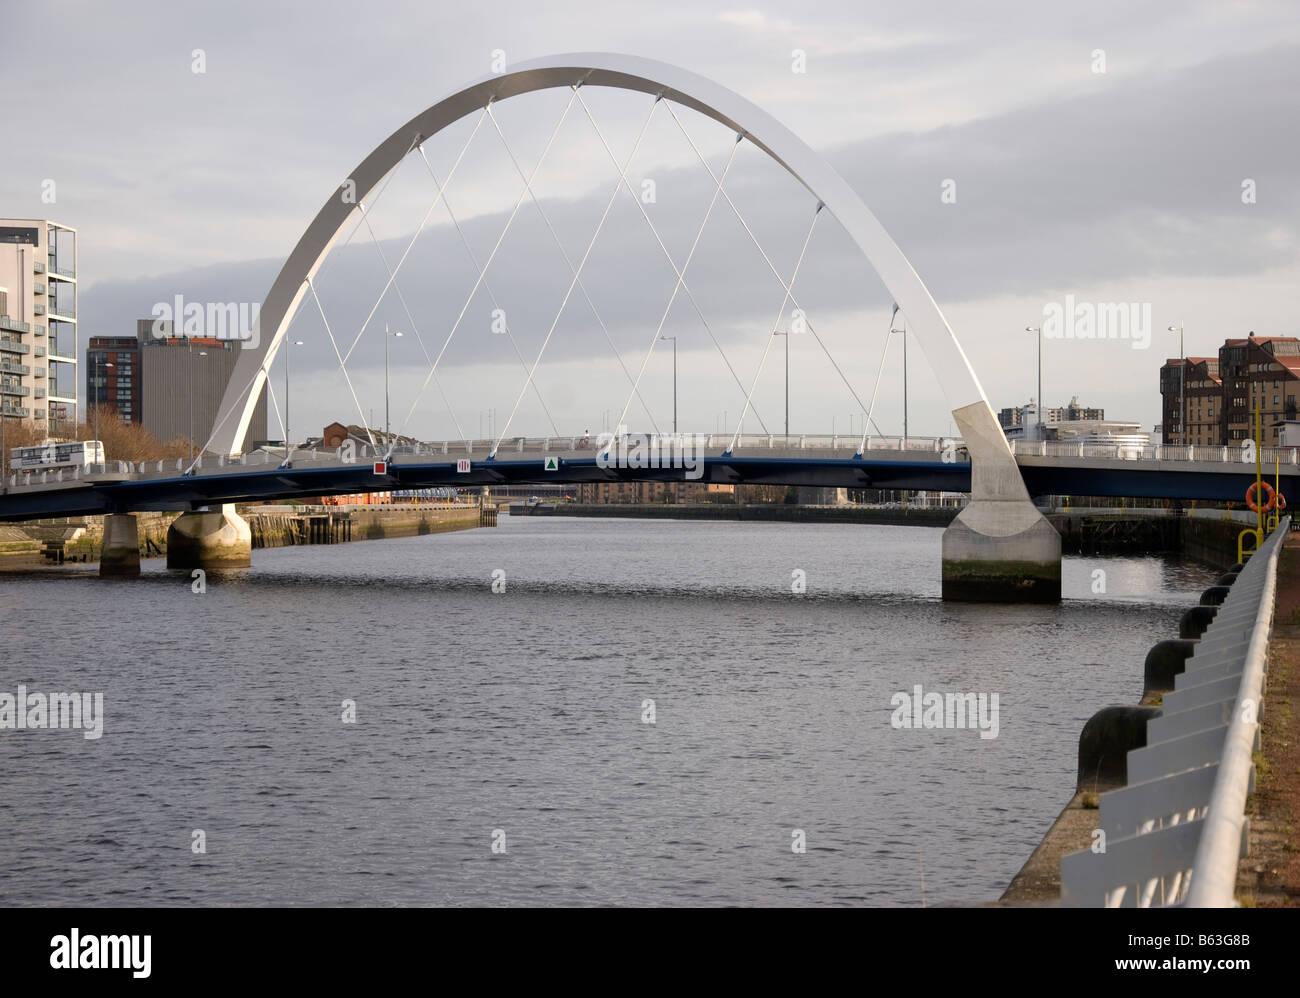 The Squinty Bridge River Clyde Finnieston Glasgow Scotland U.K. United Kingdom - Stock Image